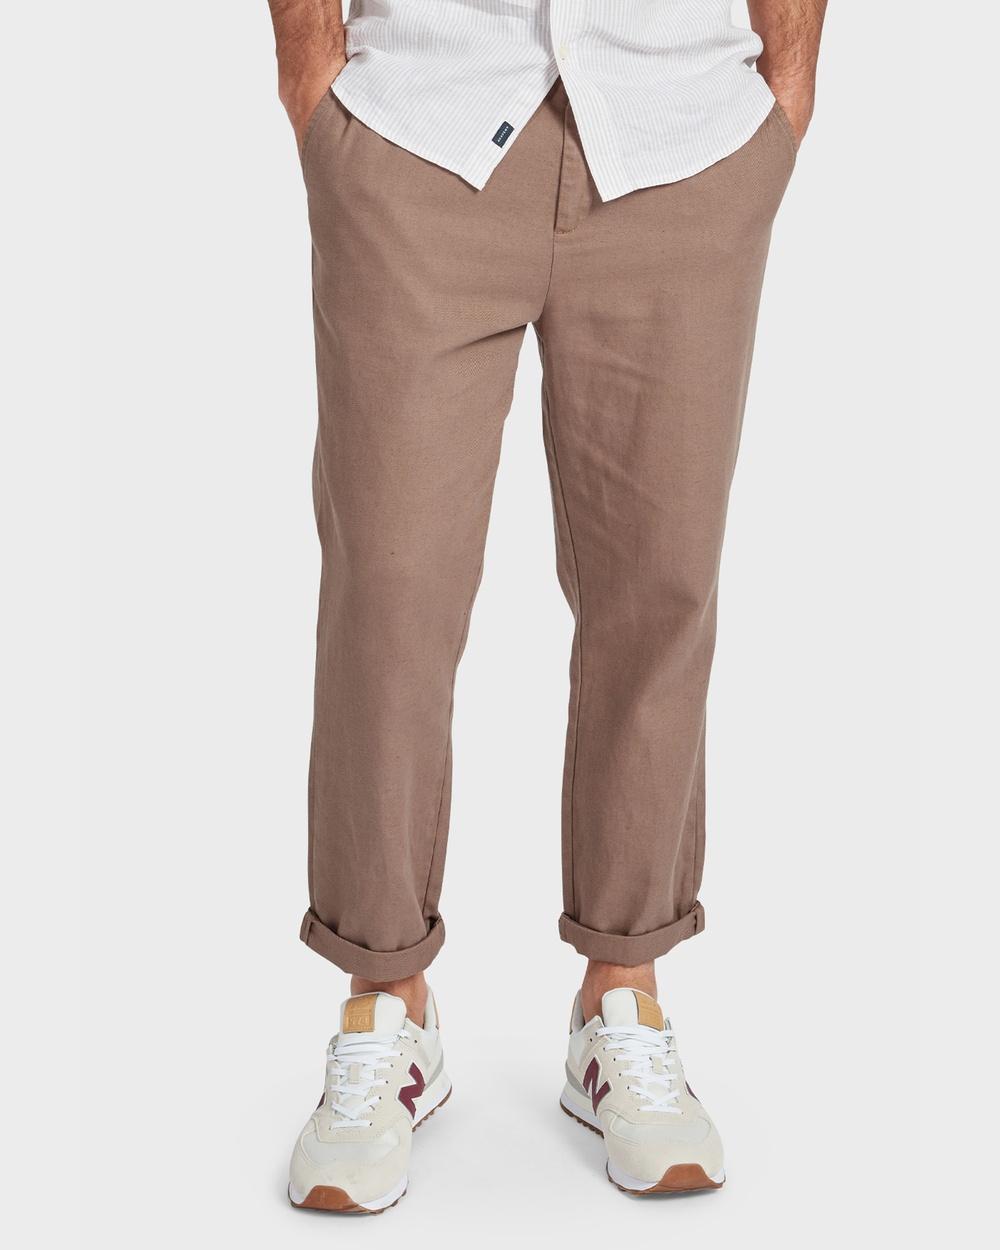 Academy Brand Standard Beach Pant Cargo Pants Brown